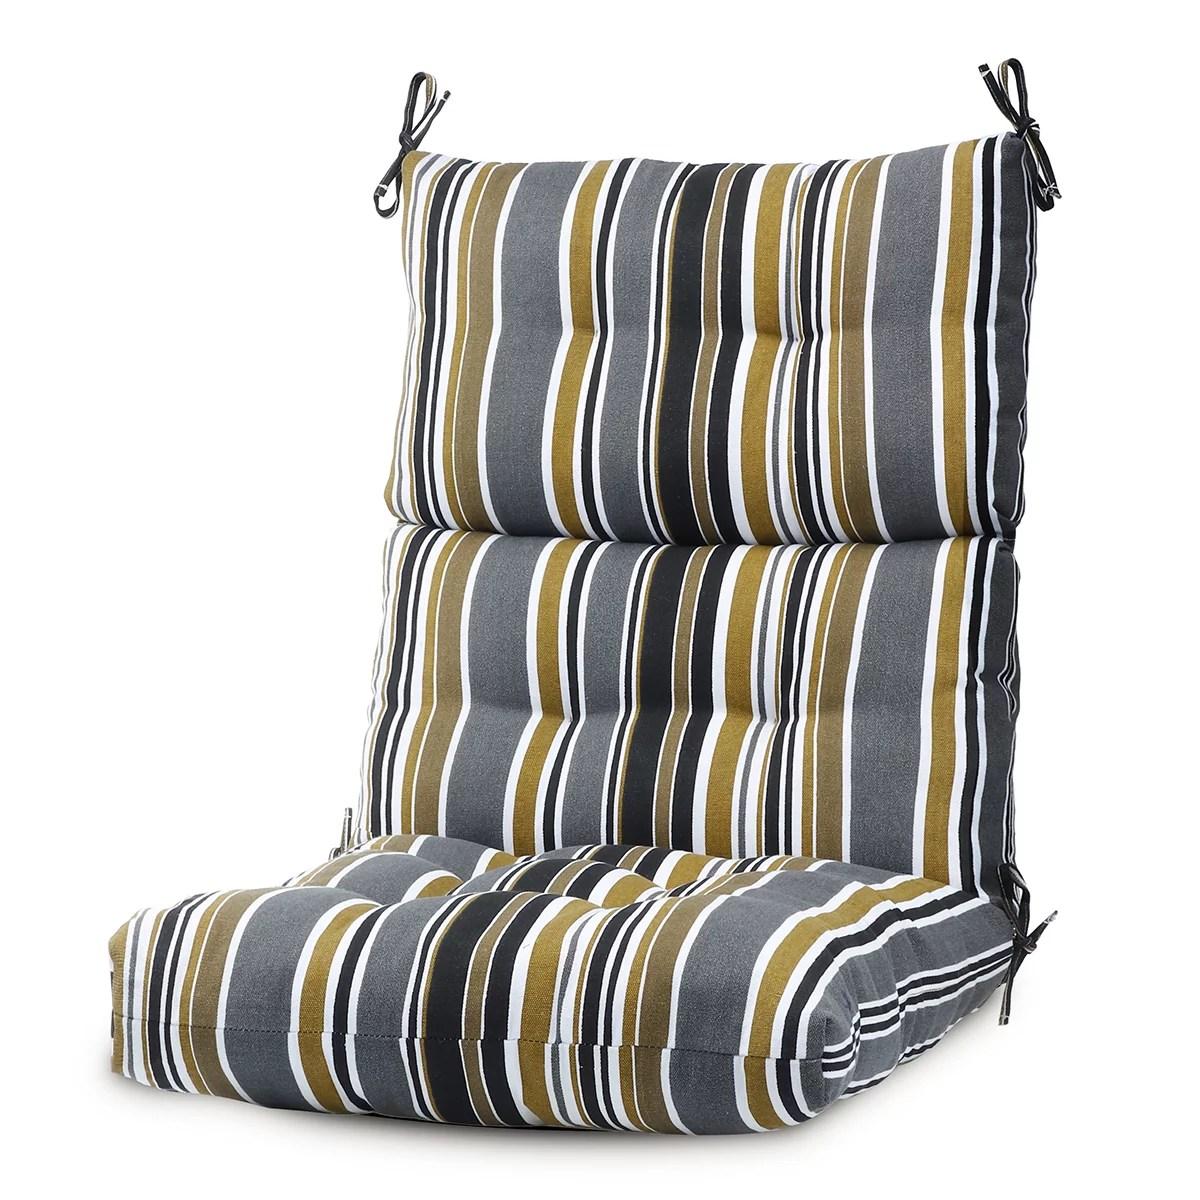 romhouse 1 2 4 pcs 44x21 inch outdoor chair cushion high back rocking chair cushions patio garden high rebound foam waterproof polyester seat cushions